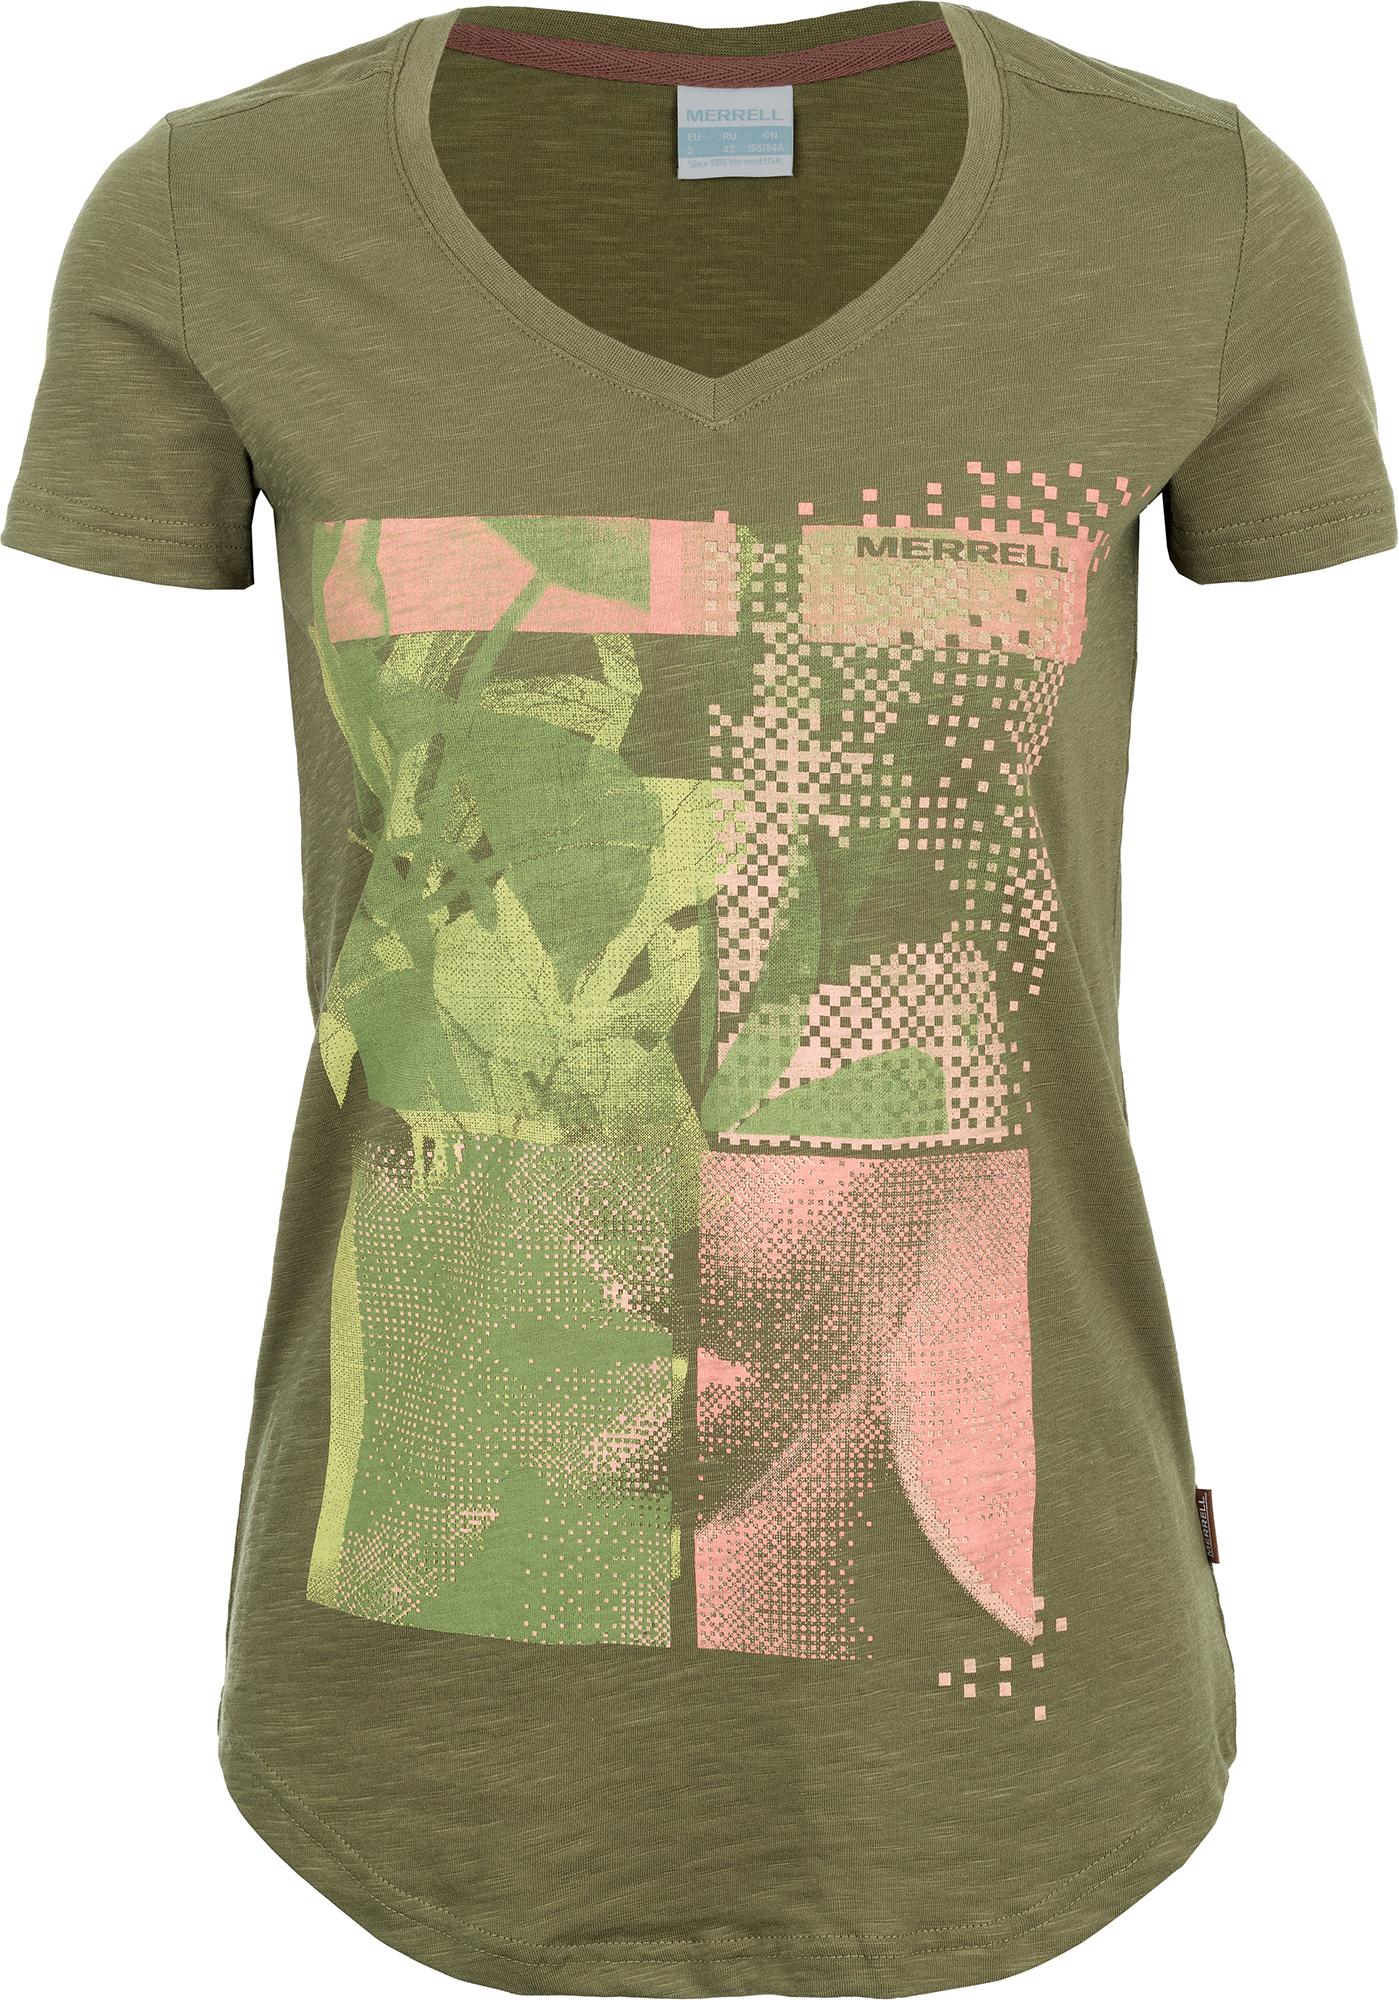 Merrell Футболка женская Merrell merrell рубашка с длинным рукавом женская merrell cilicia